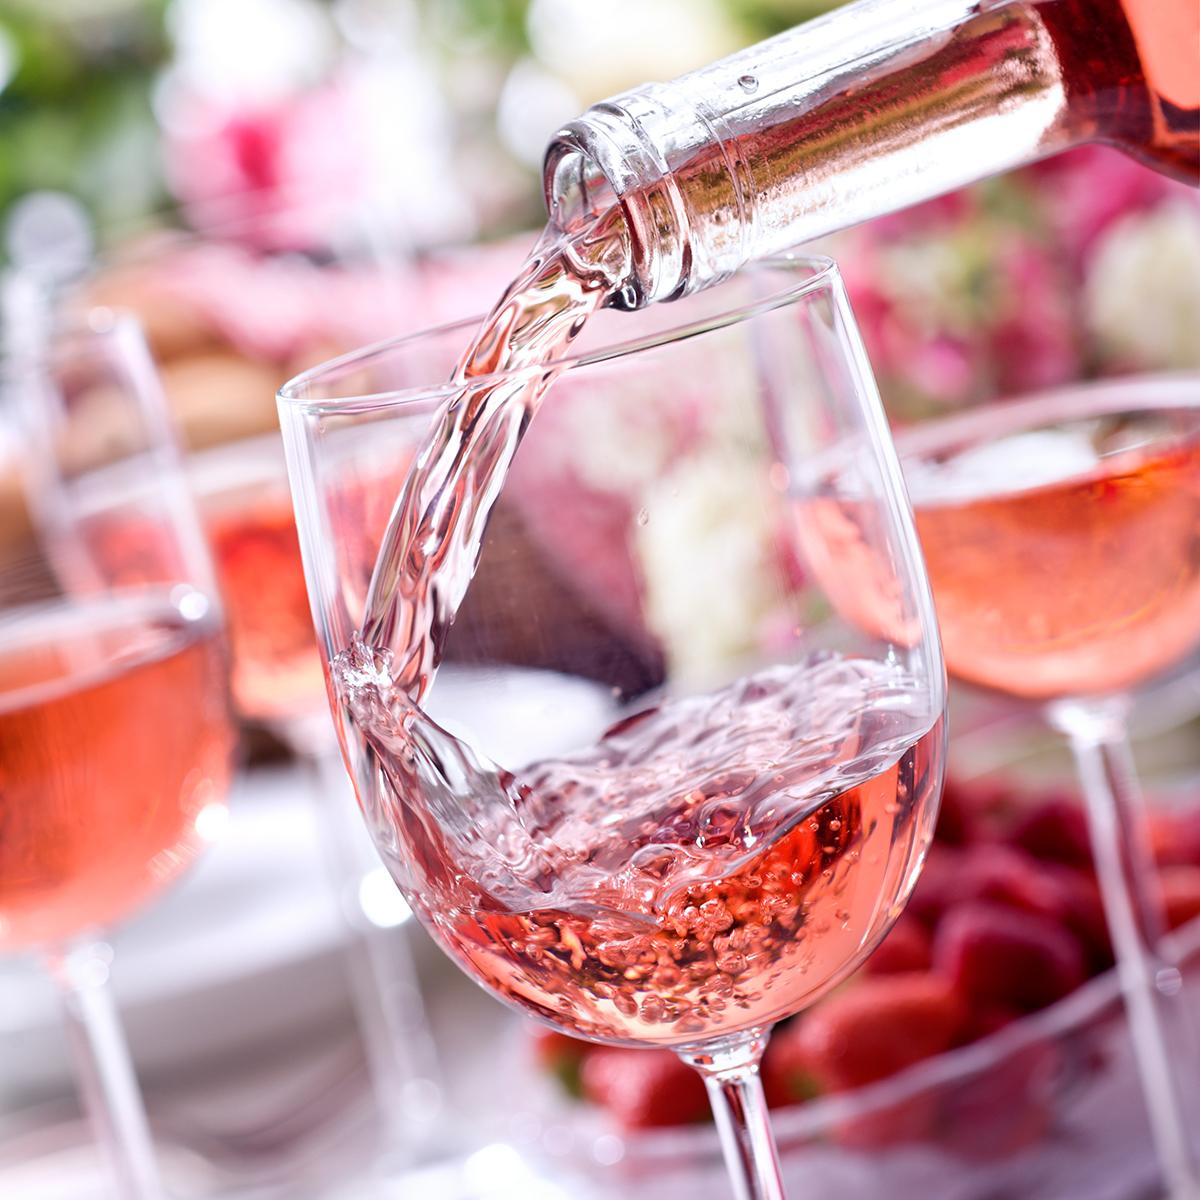 vino rosado maridaje perfecto